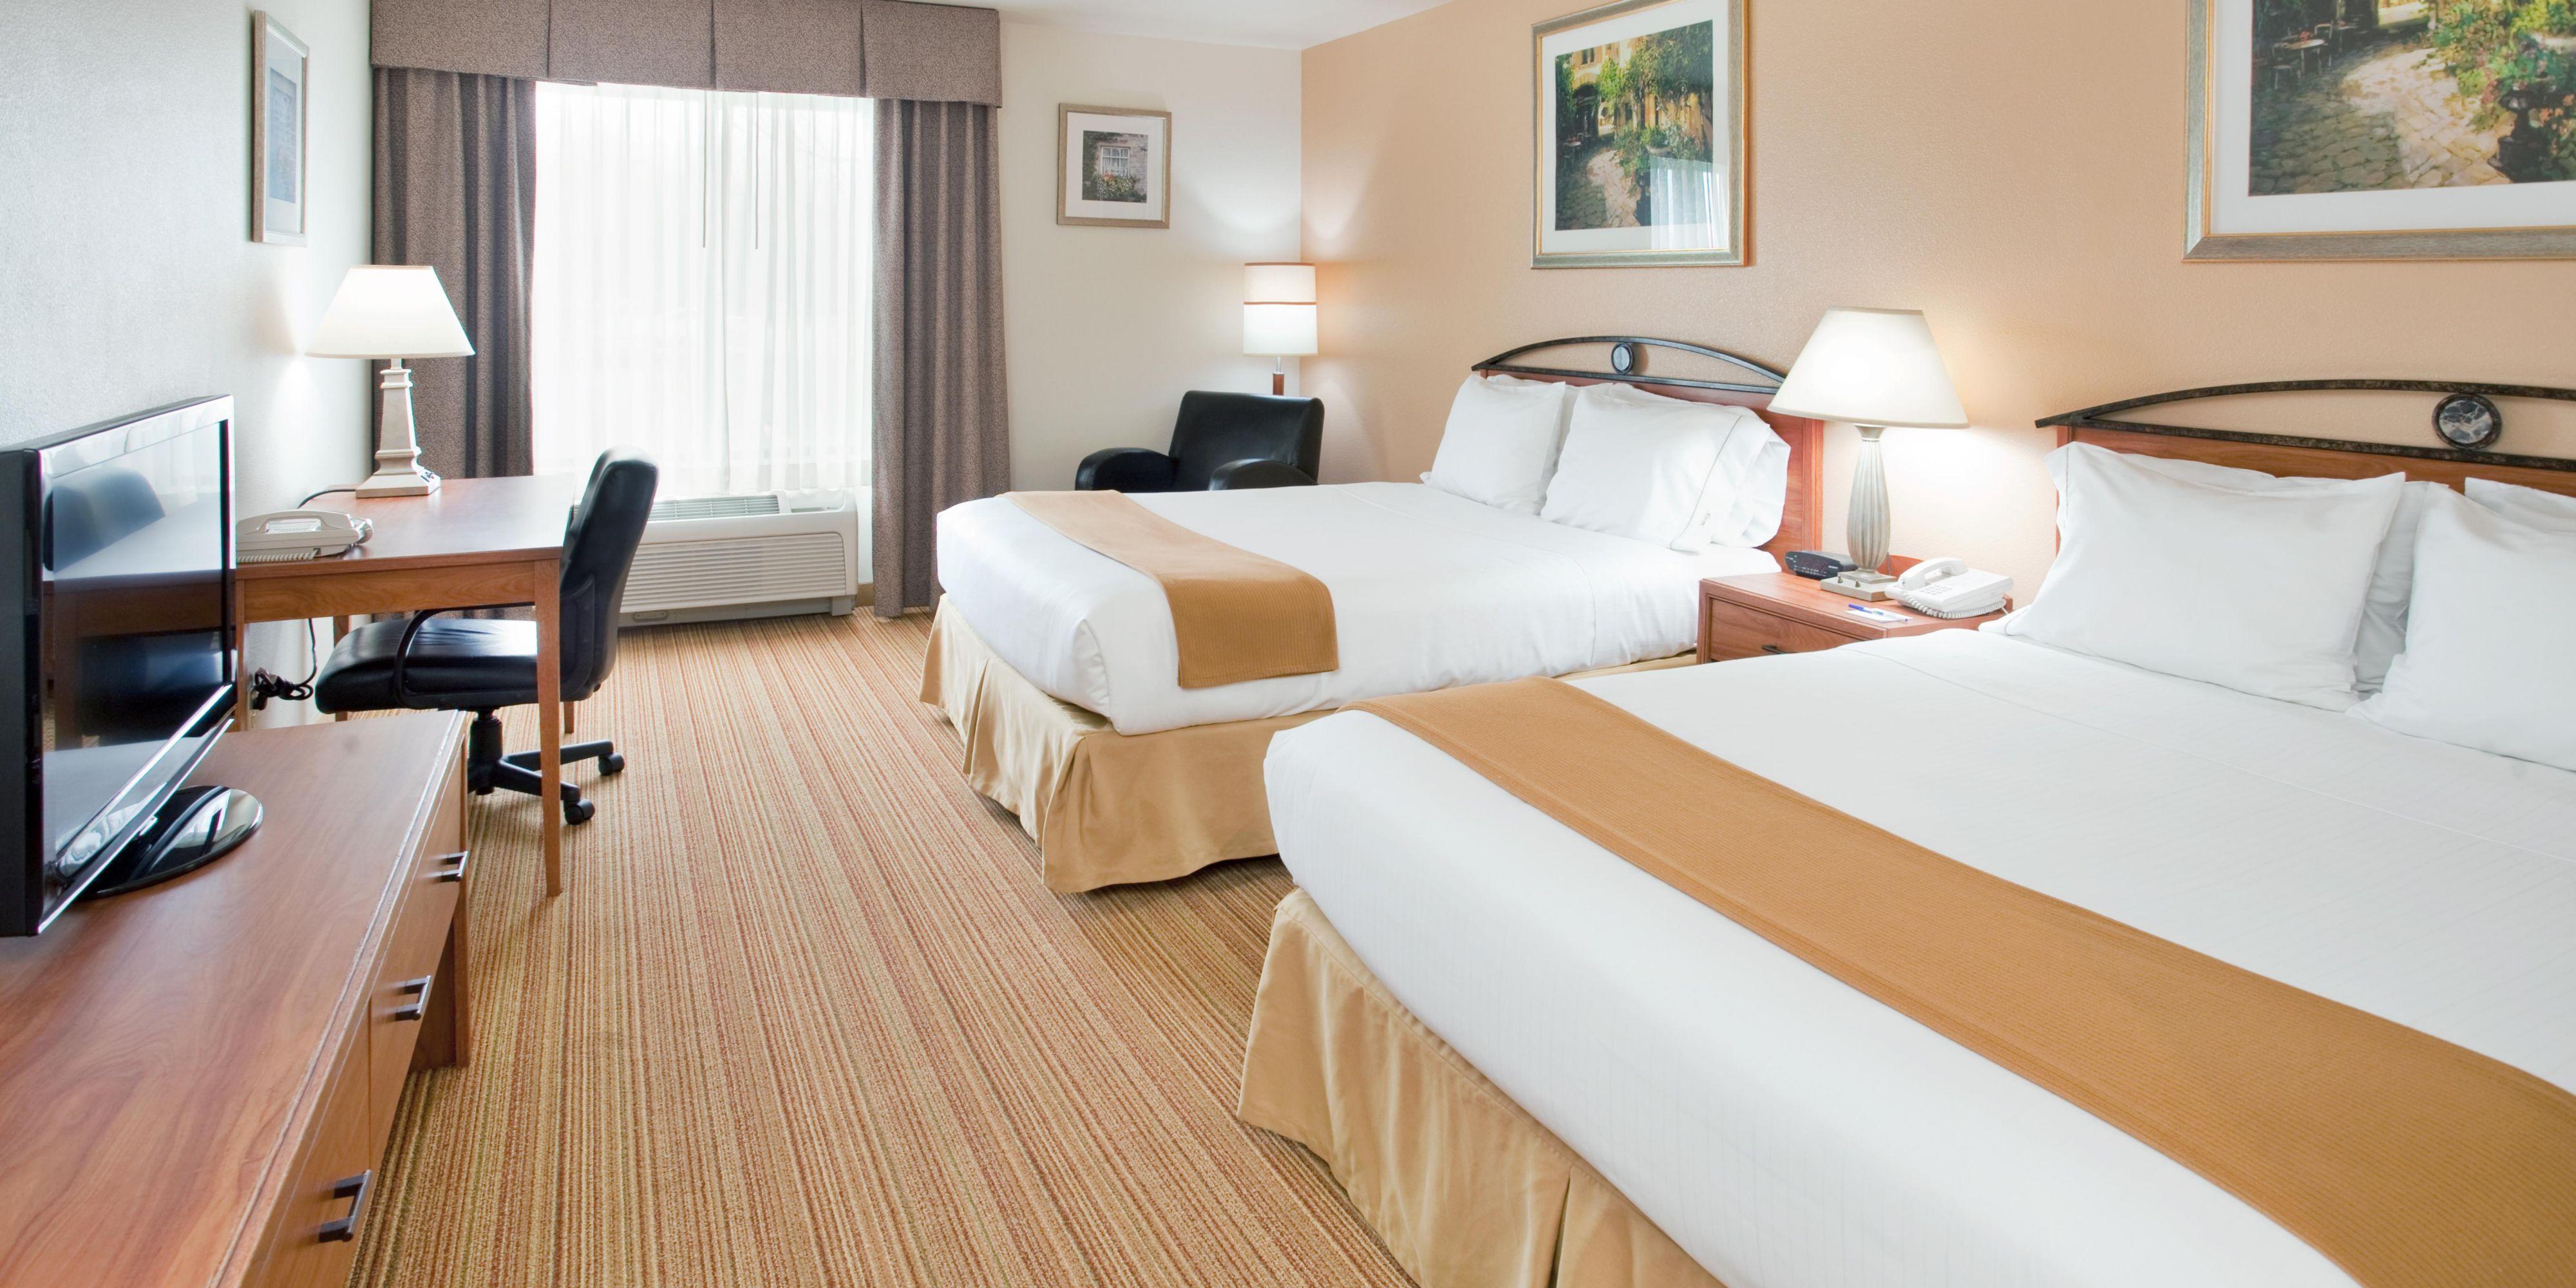 Holiday Inn Express Germantown 4287748218 2x1